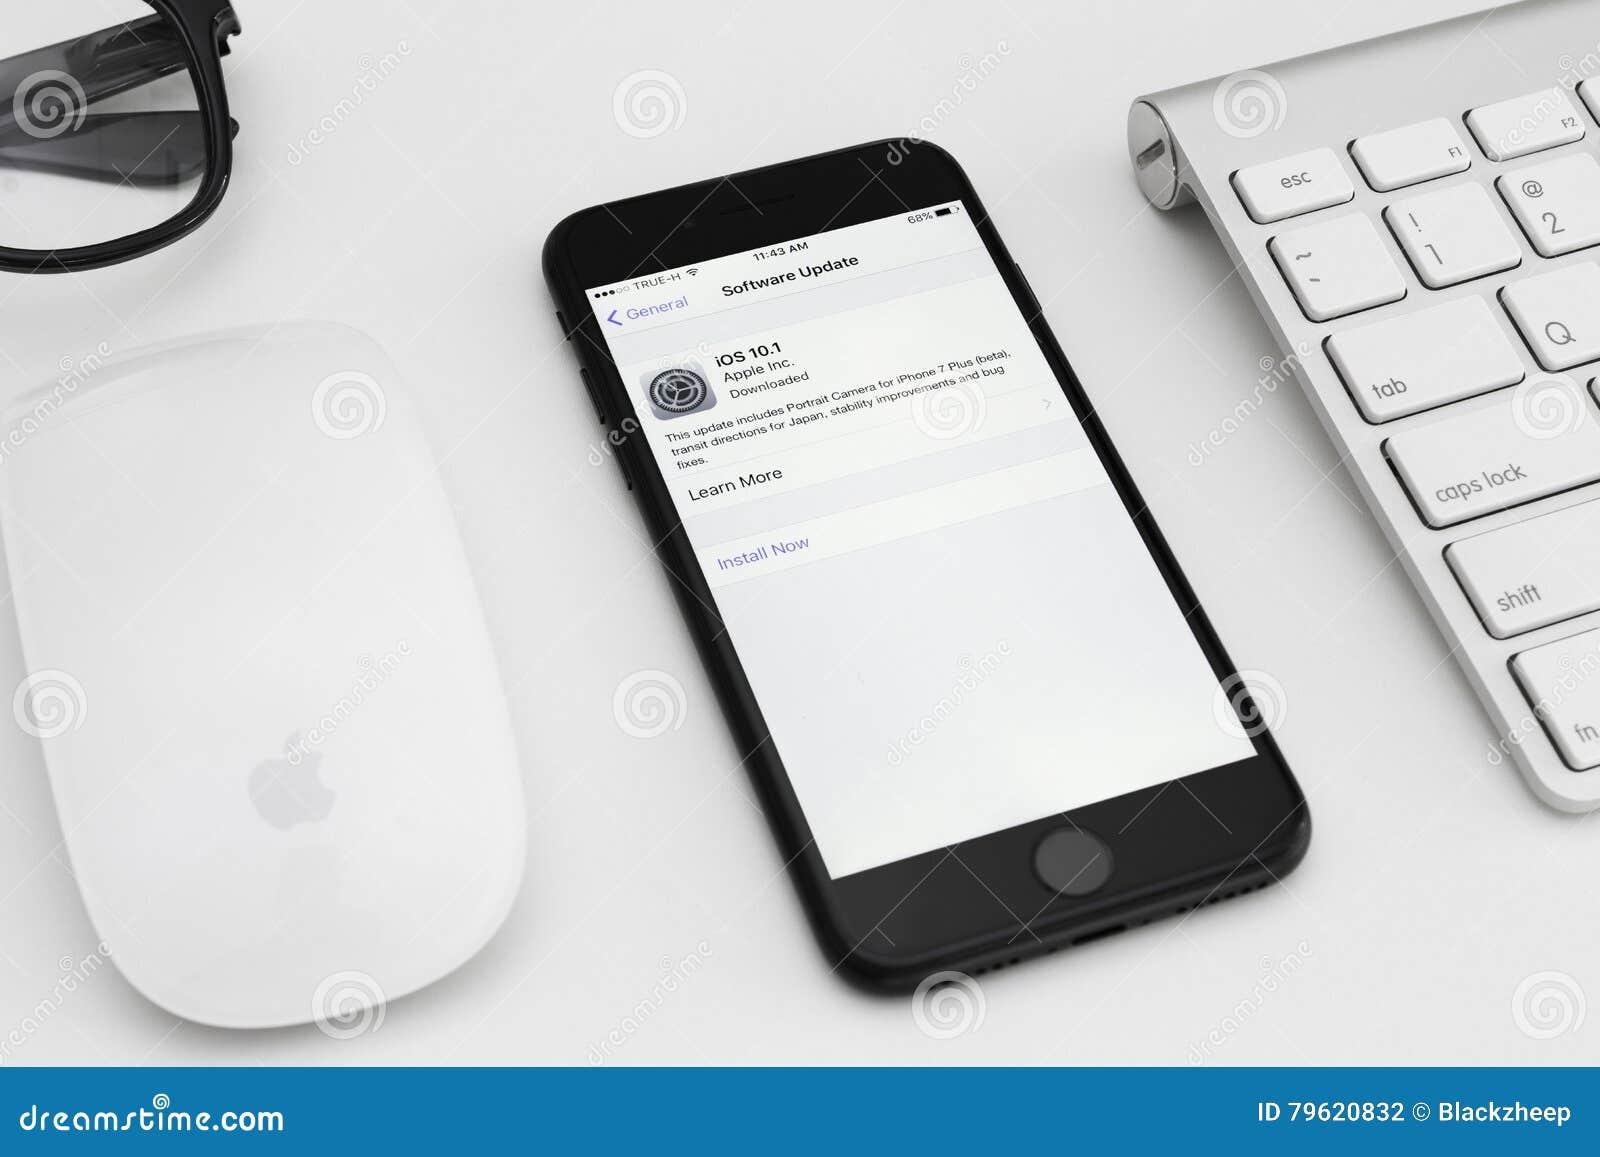 apple inc ios 10 download